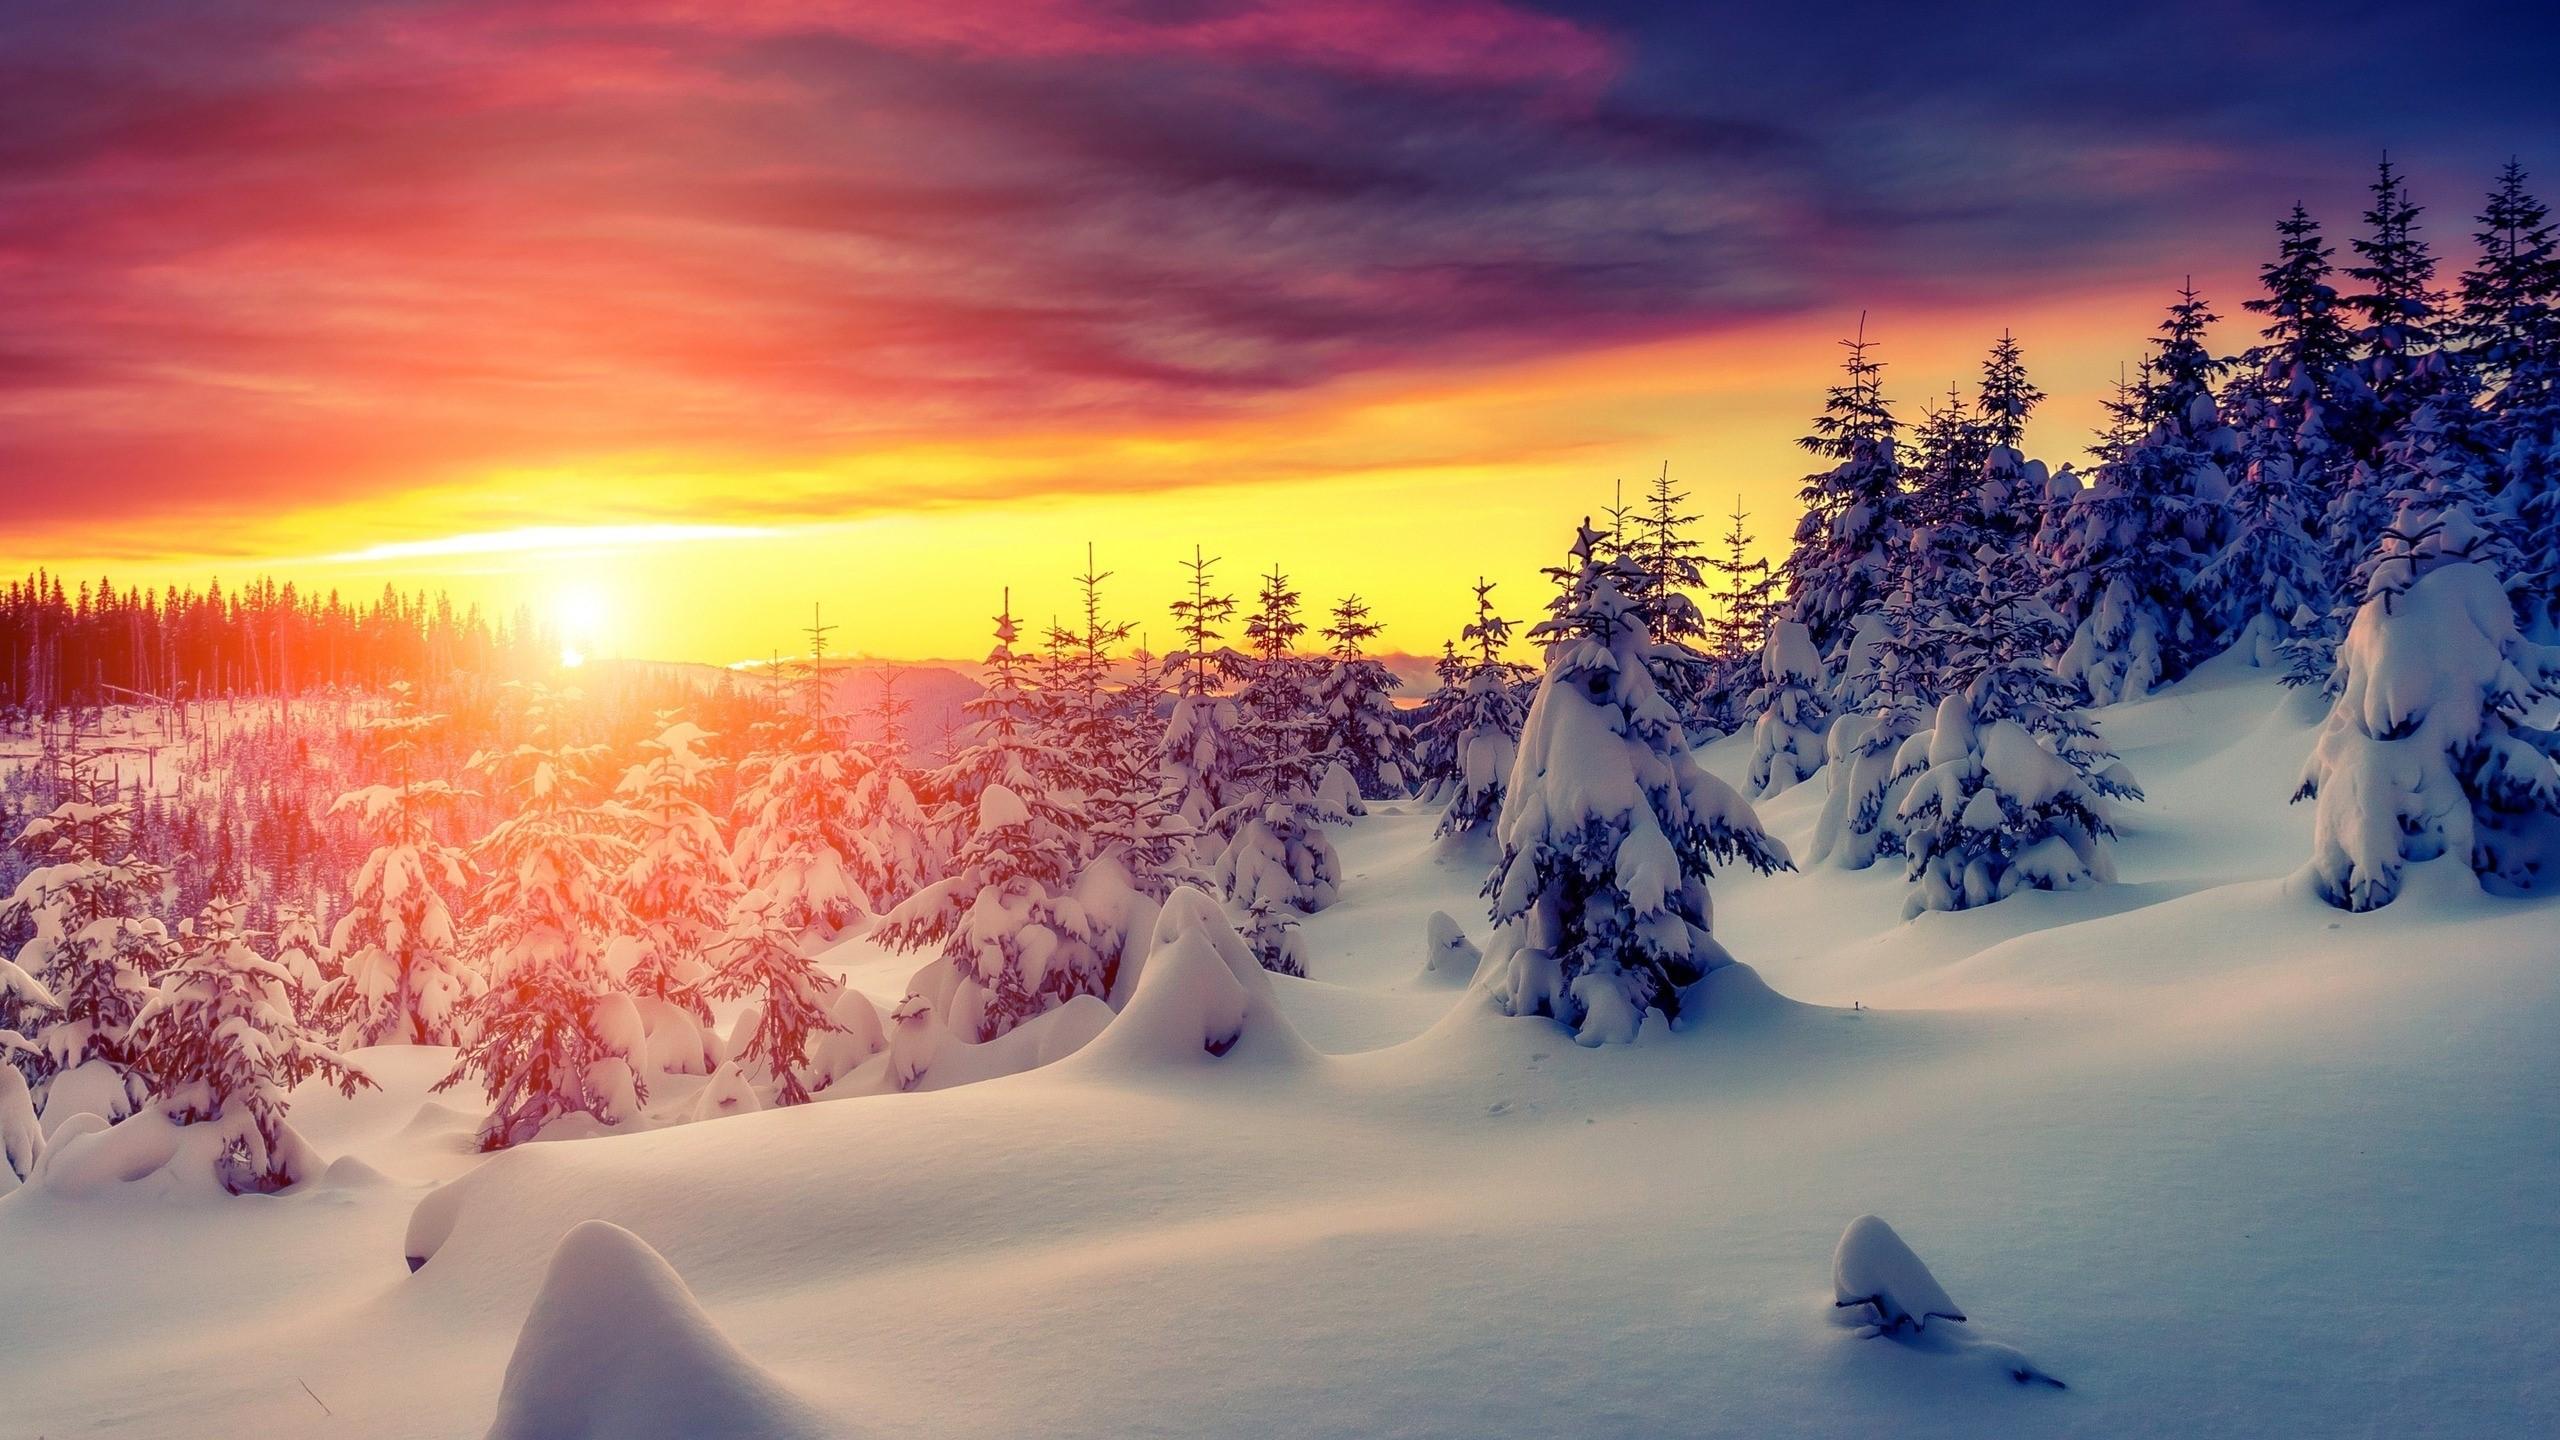 Beautiful Winter Sunrise Wallpaper 2560x1440